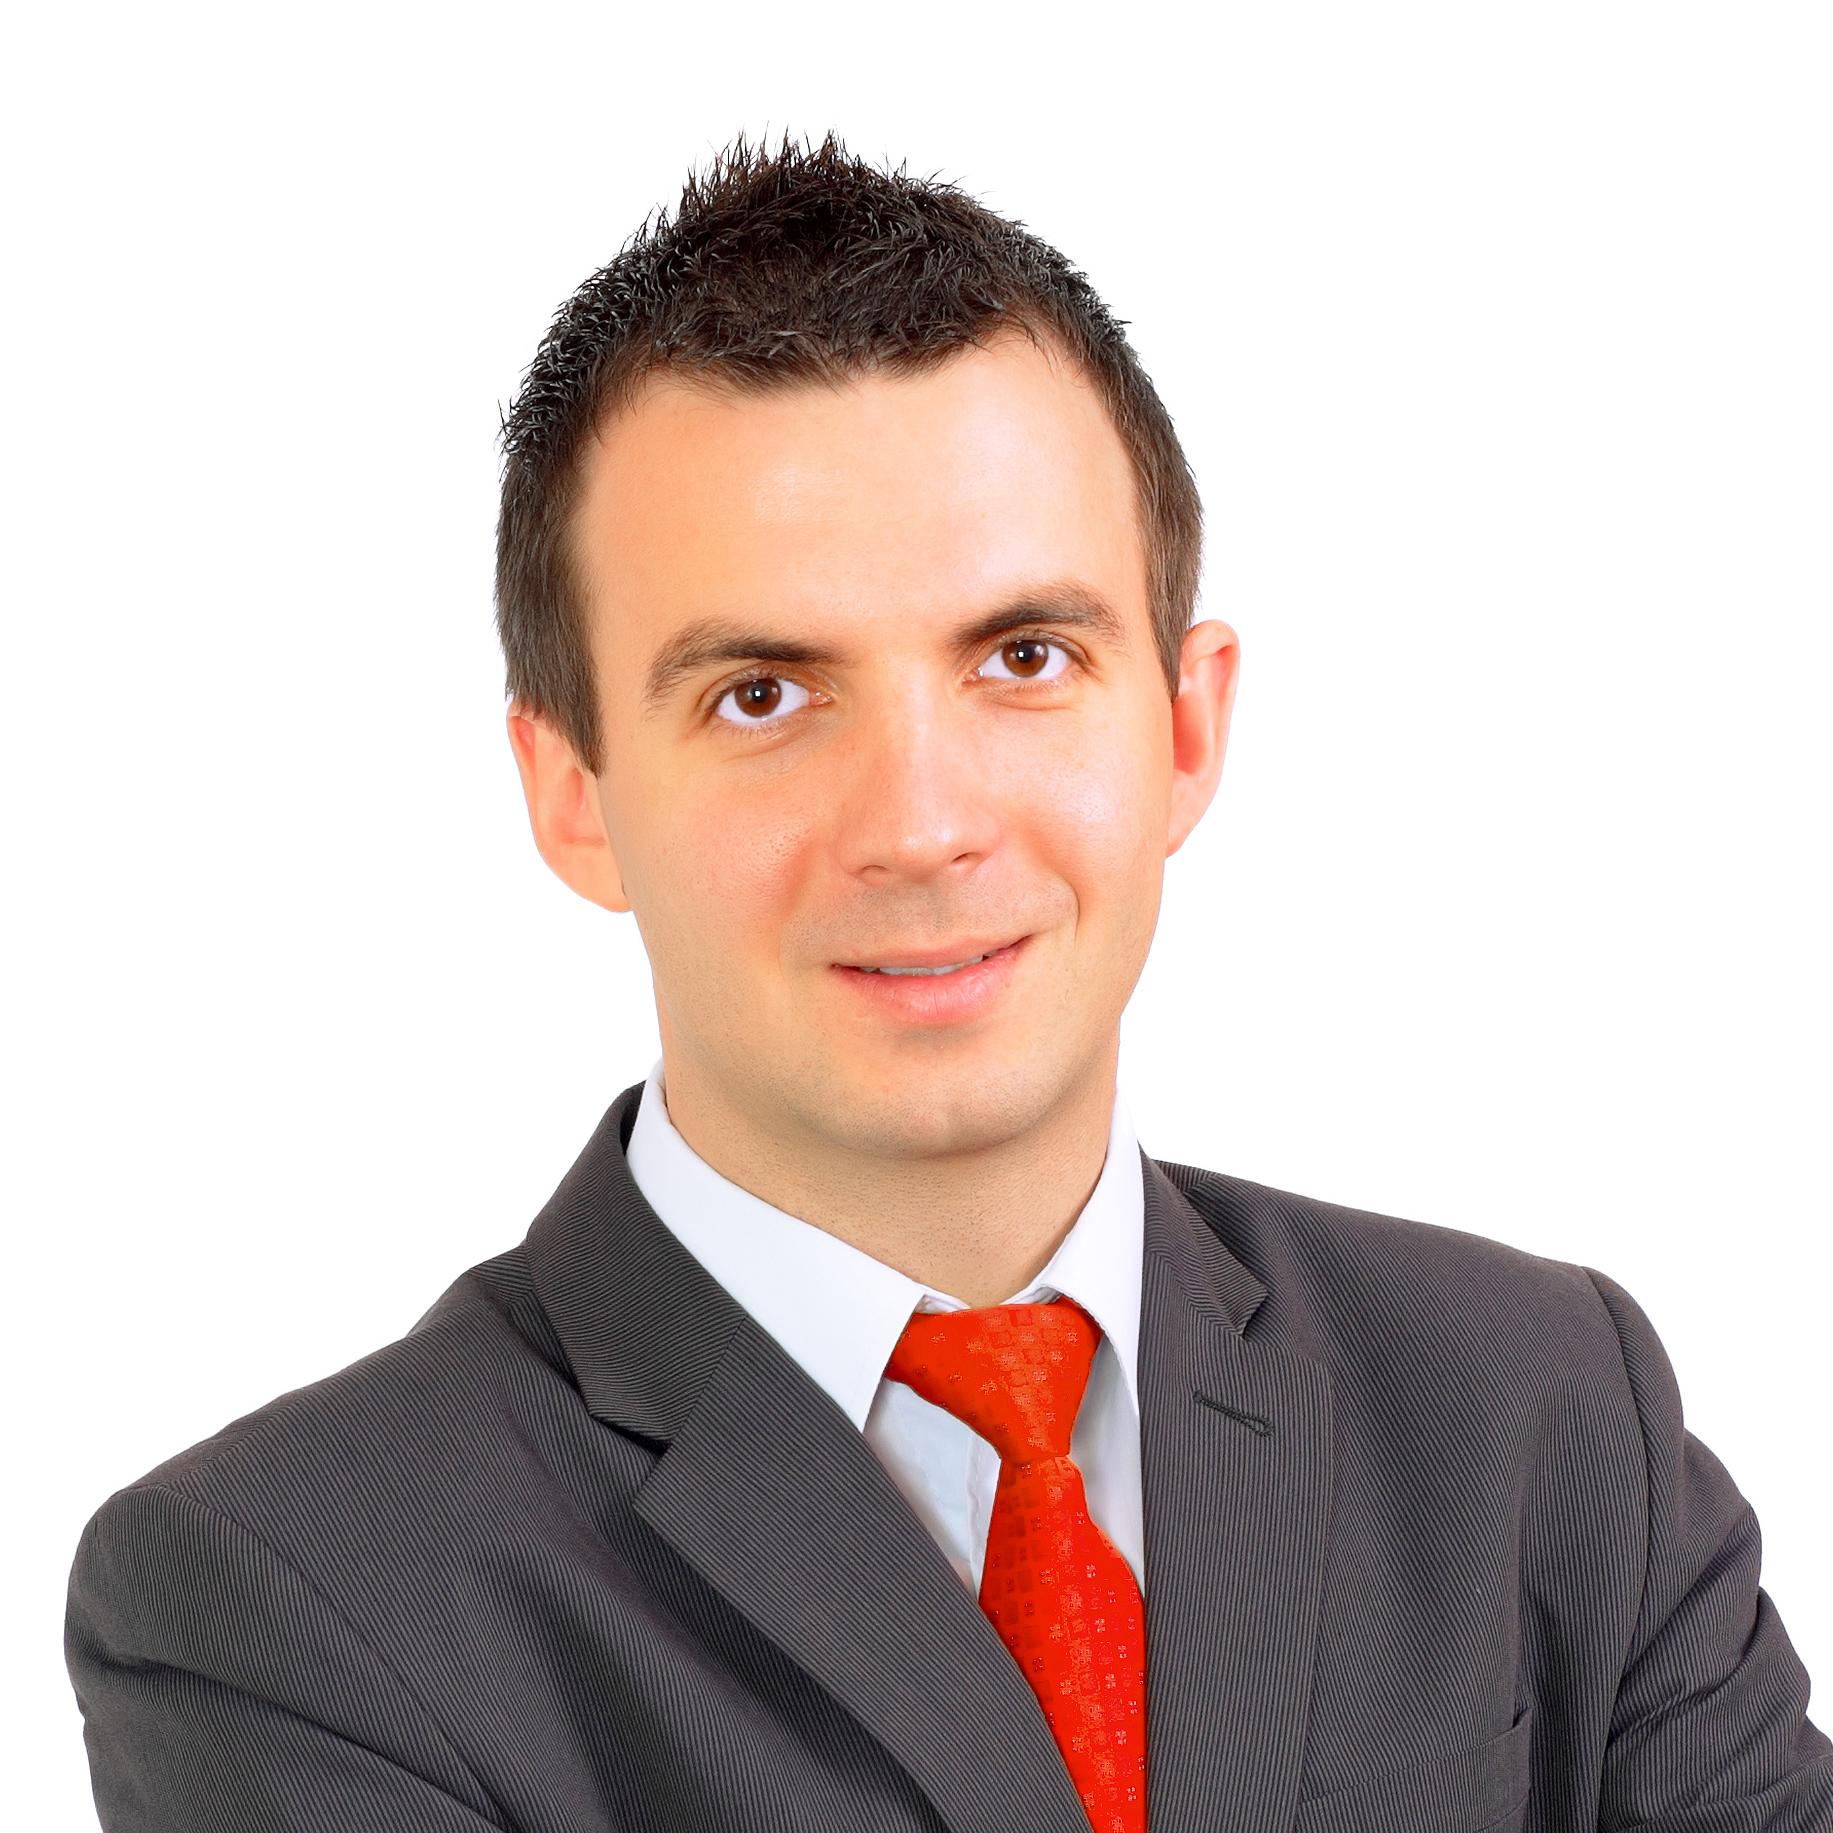 Artem Danilov   Vice President at Morgan Stanley, Russia